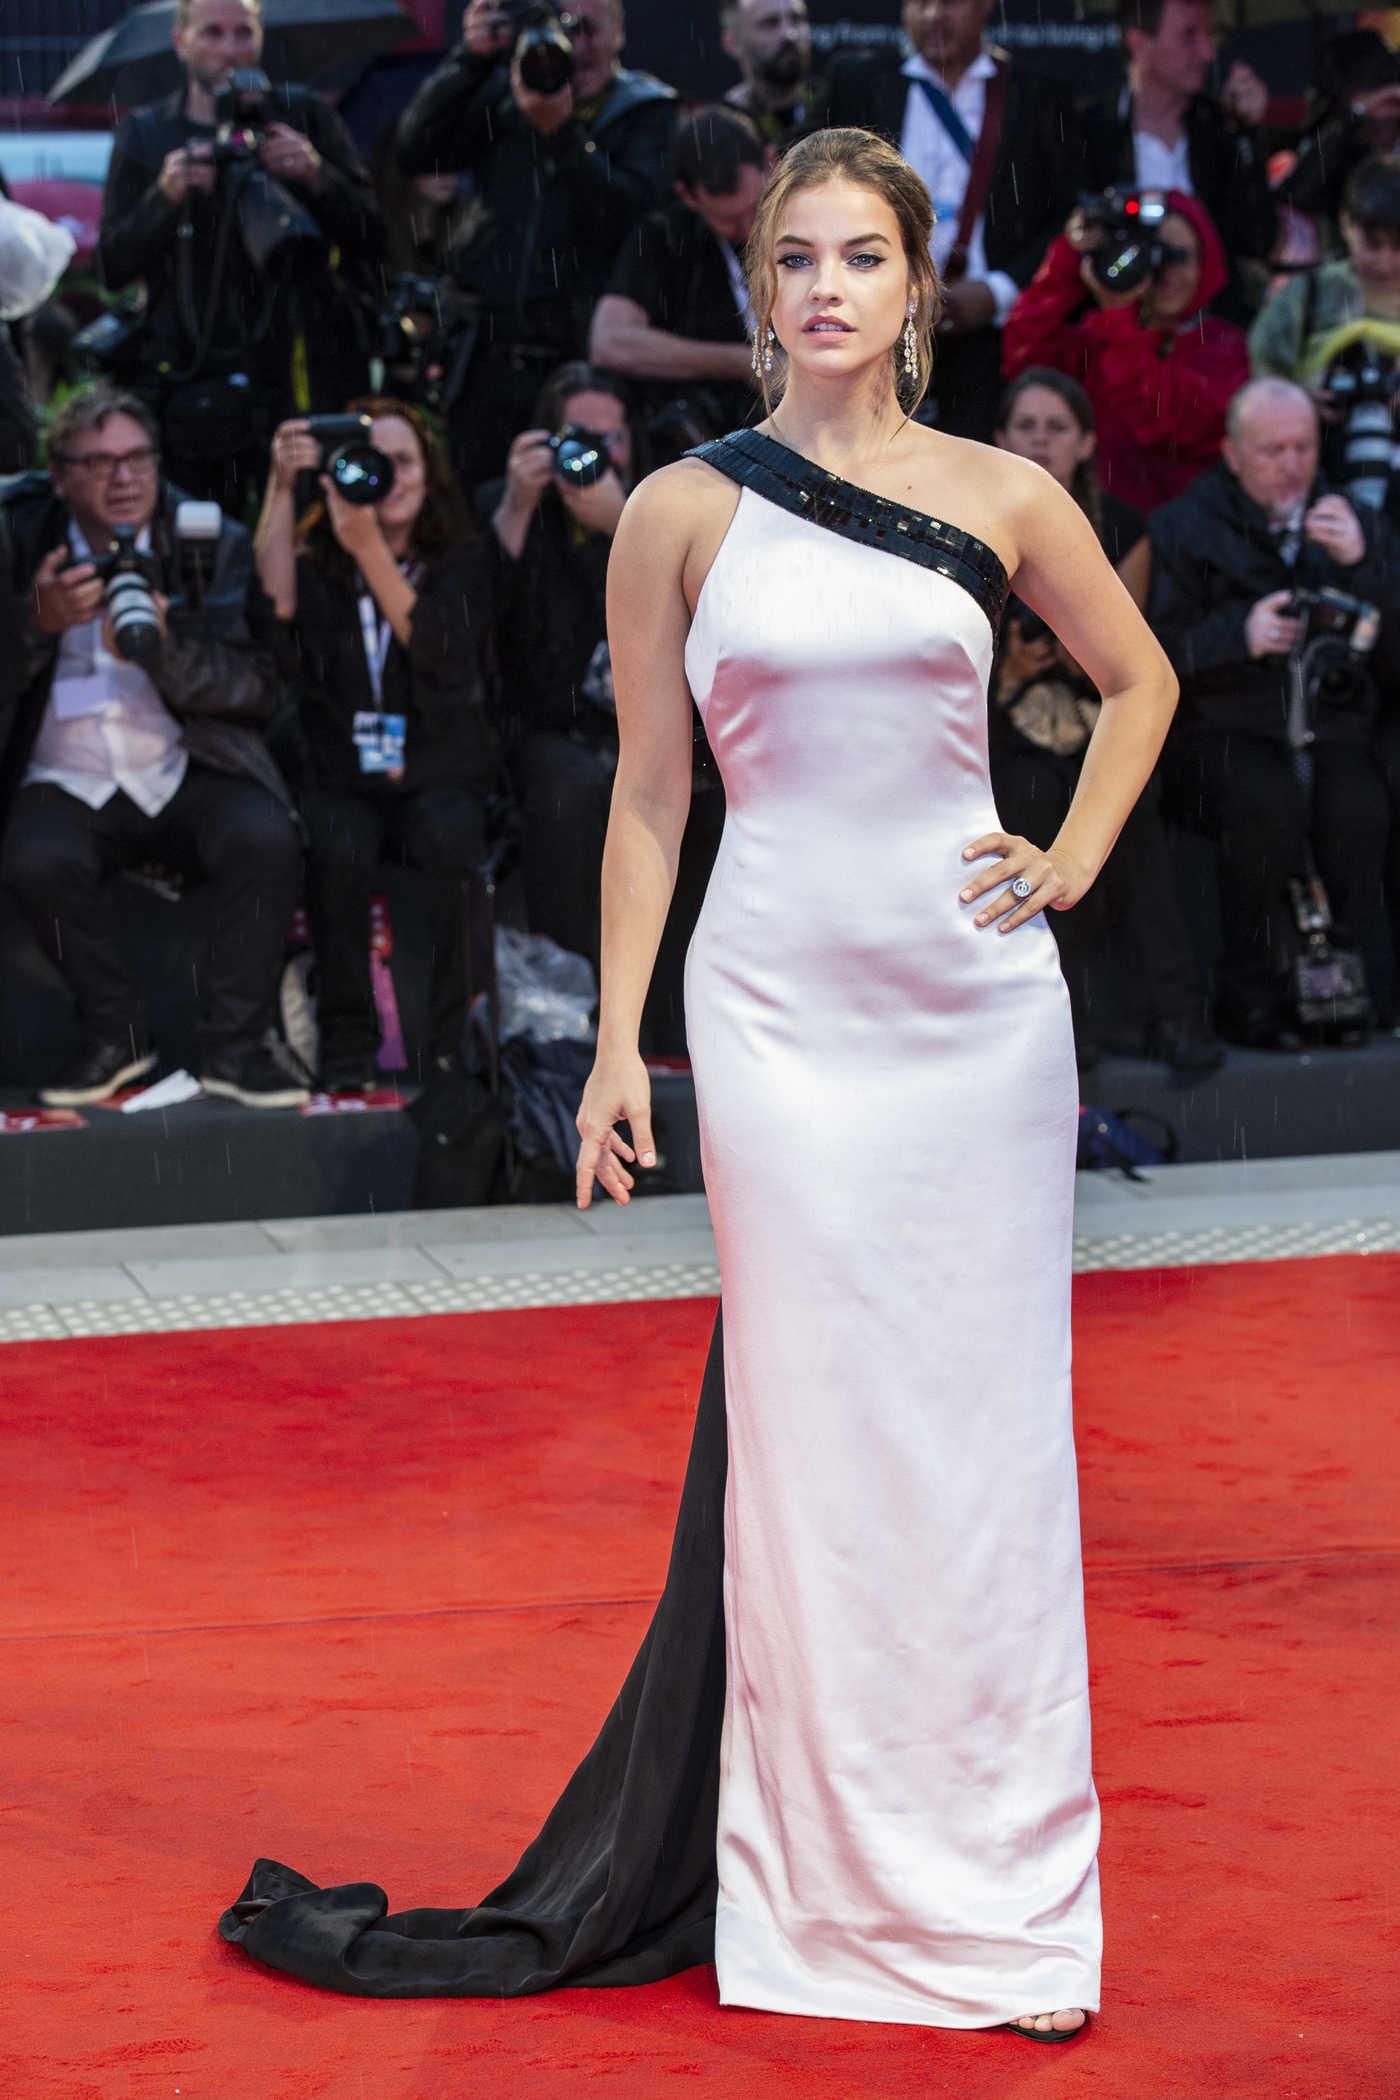 Barbara Palvin at A Star is Born Premiere During the 75th Venice Film Festival in Venice 08/31/2018